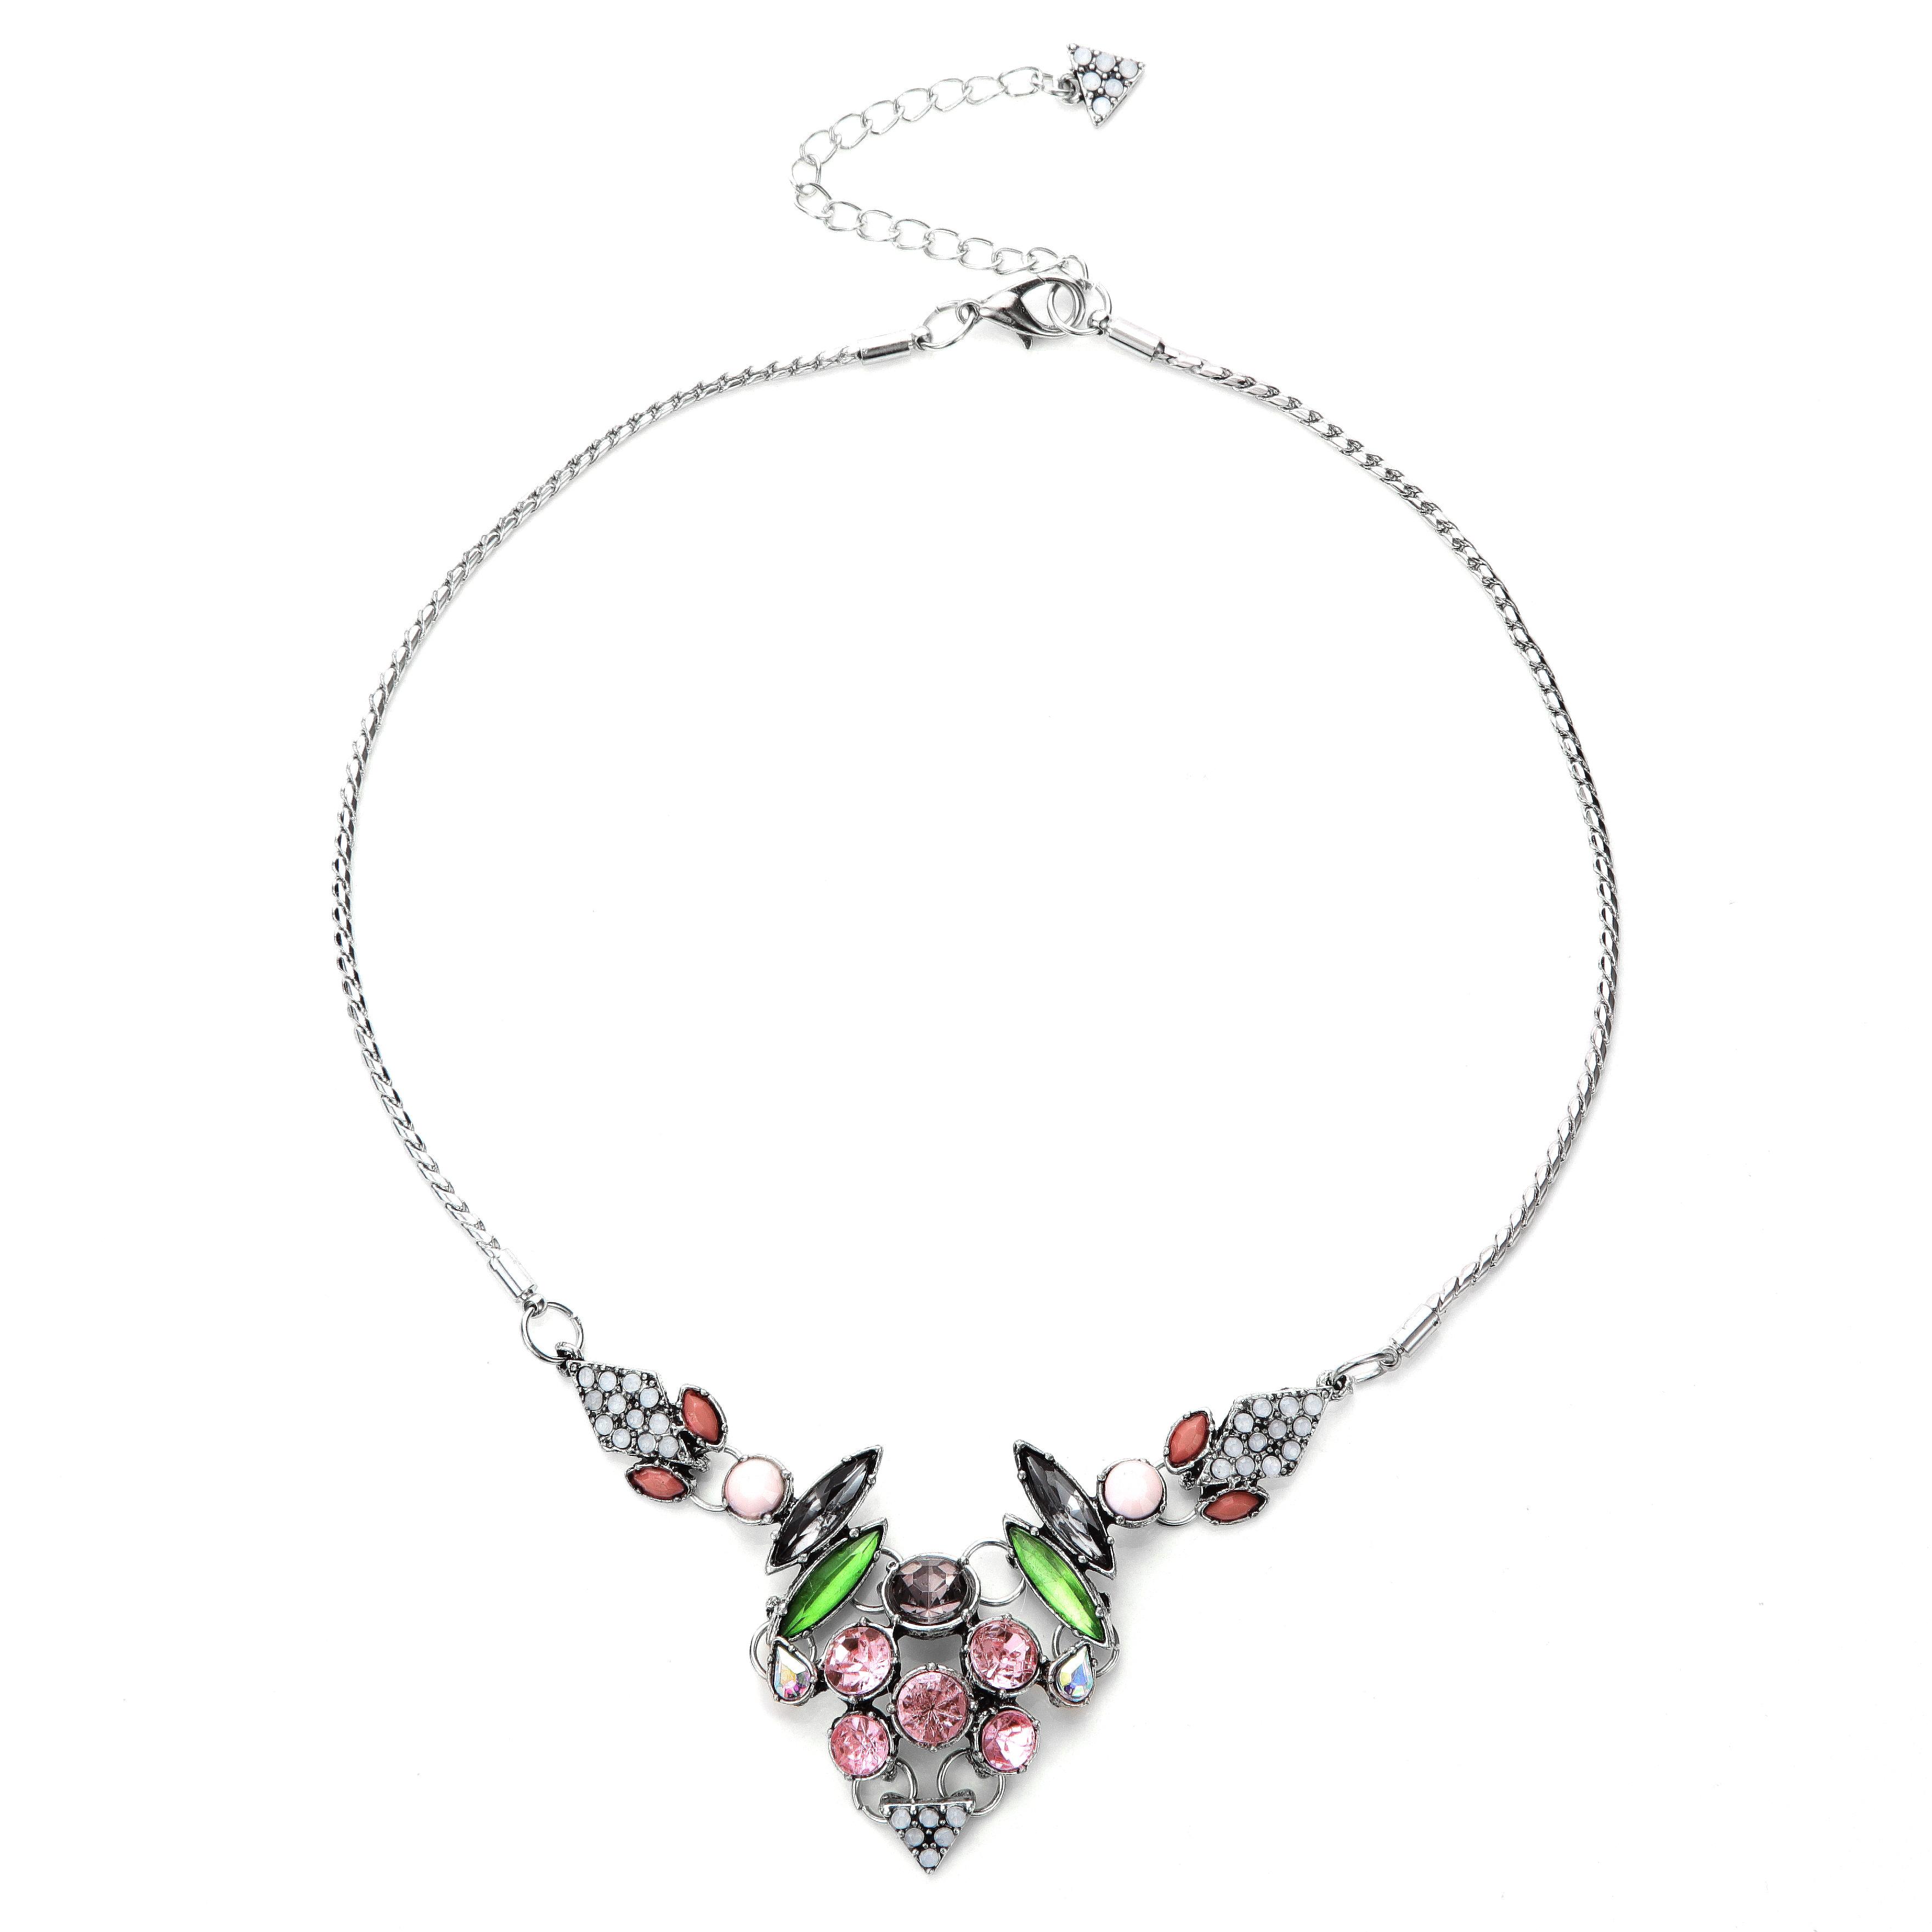 Novadab Art Deco Gloss Multicolored Statement Necklace